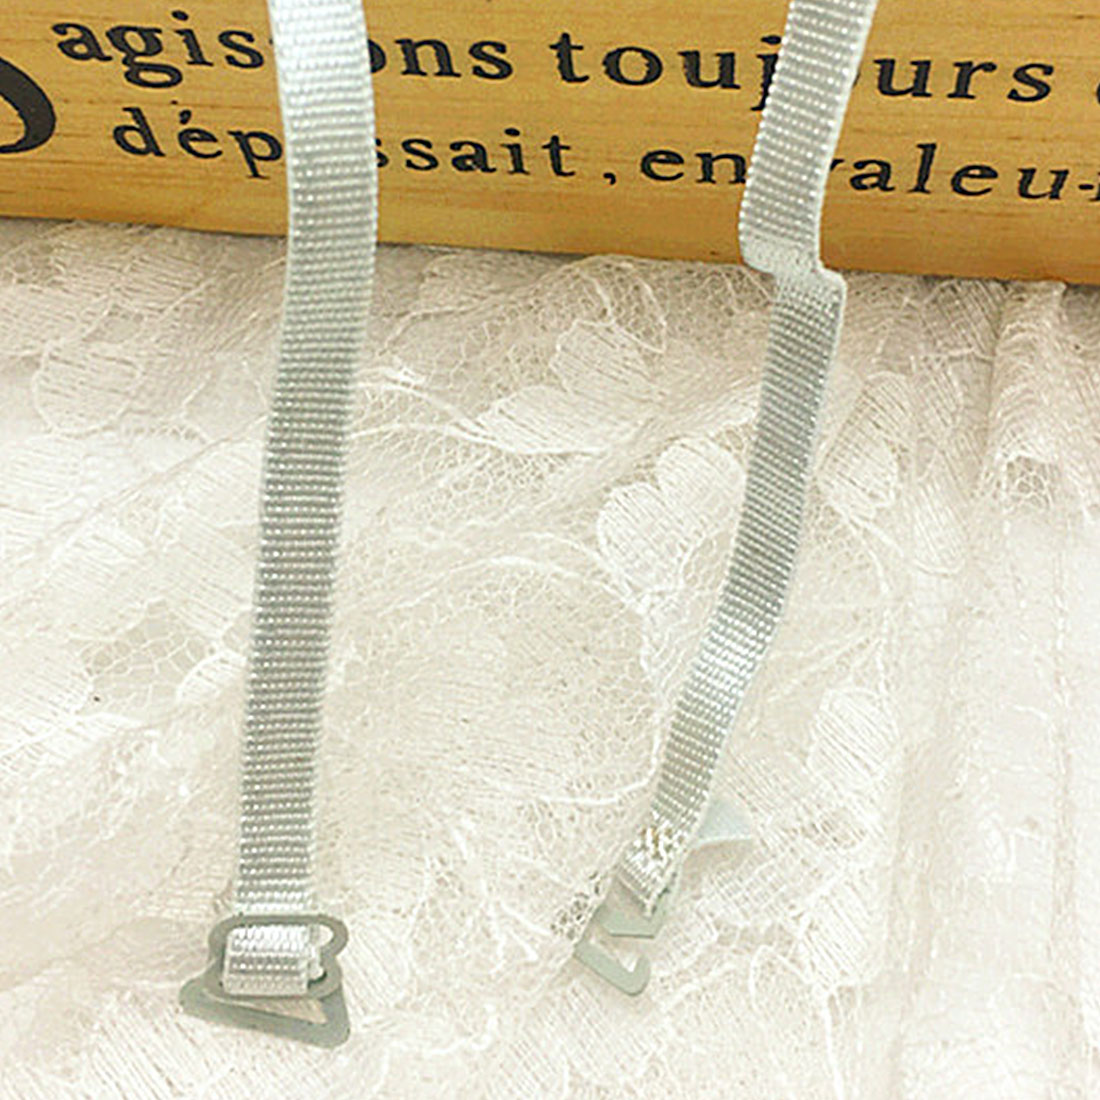 1 Pair Elastic Bra Strap Black White 1cm Width Nylon Elastic Fabric Hook Adjustable Bra Straps For Ladies With Metal Clips